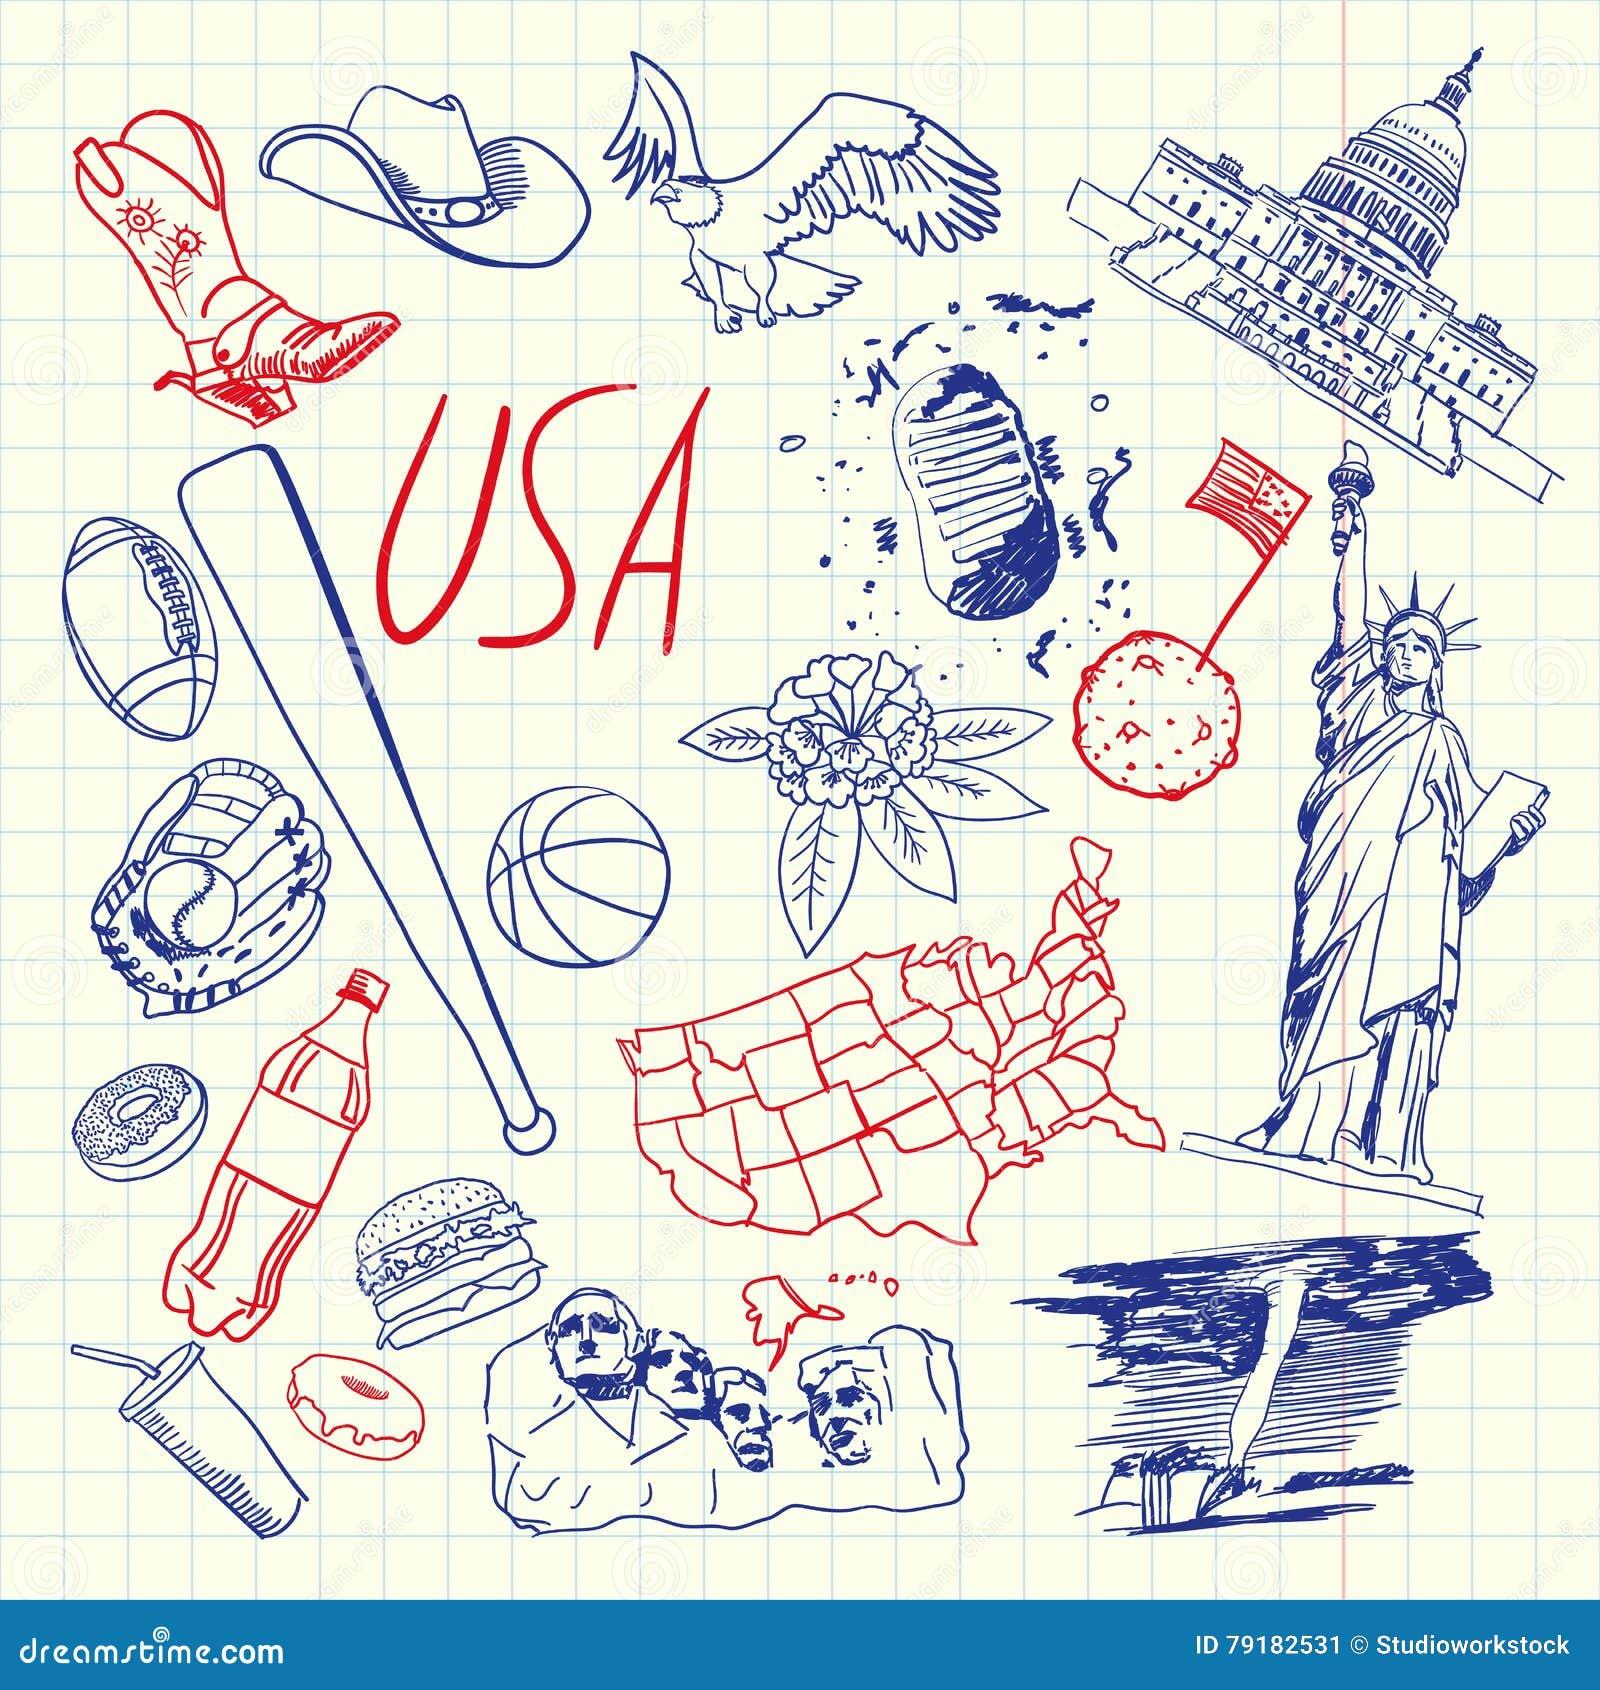 Usa symbols pen drawn doodles vector collection stock vector usa symbols pen drawn doodles vector collection ccuart Choice Image